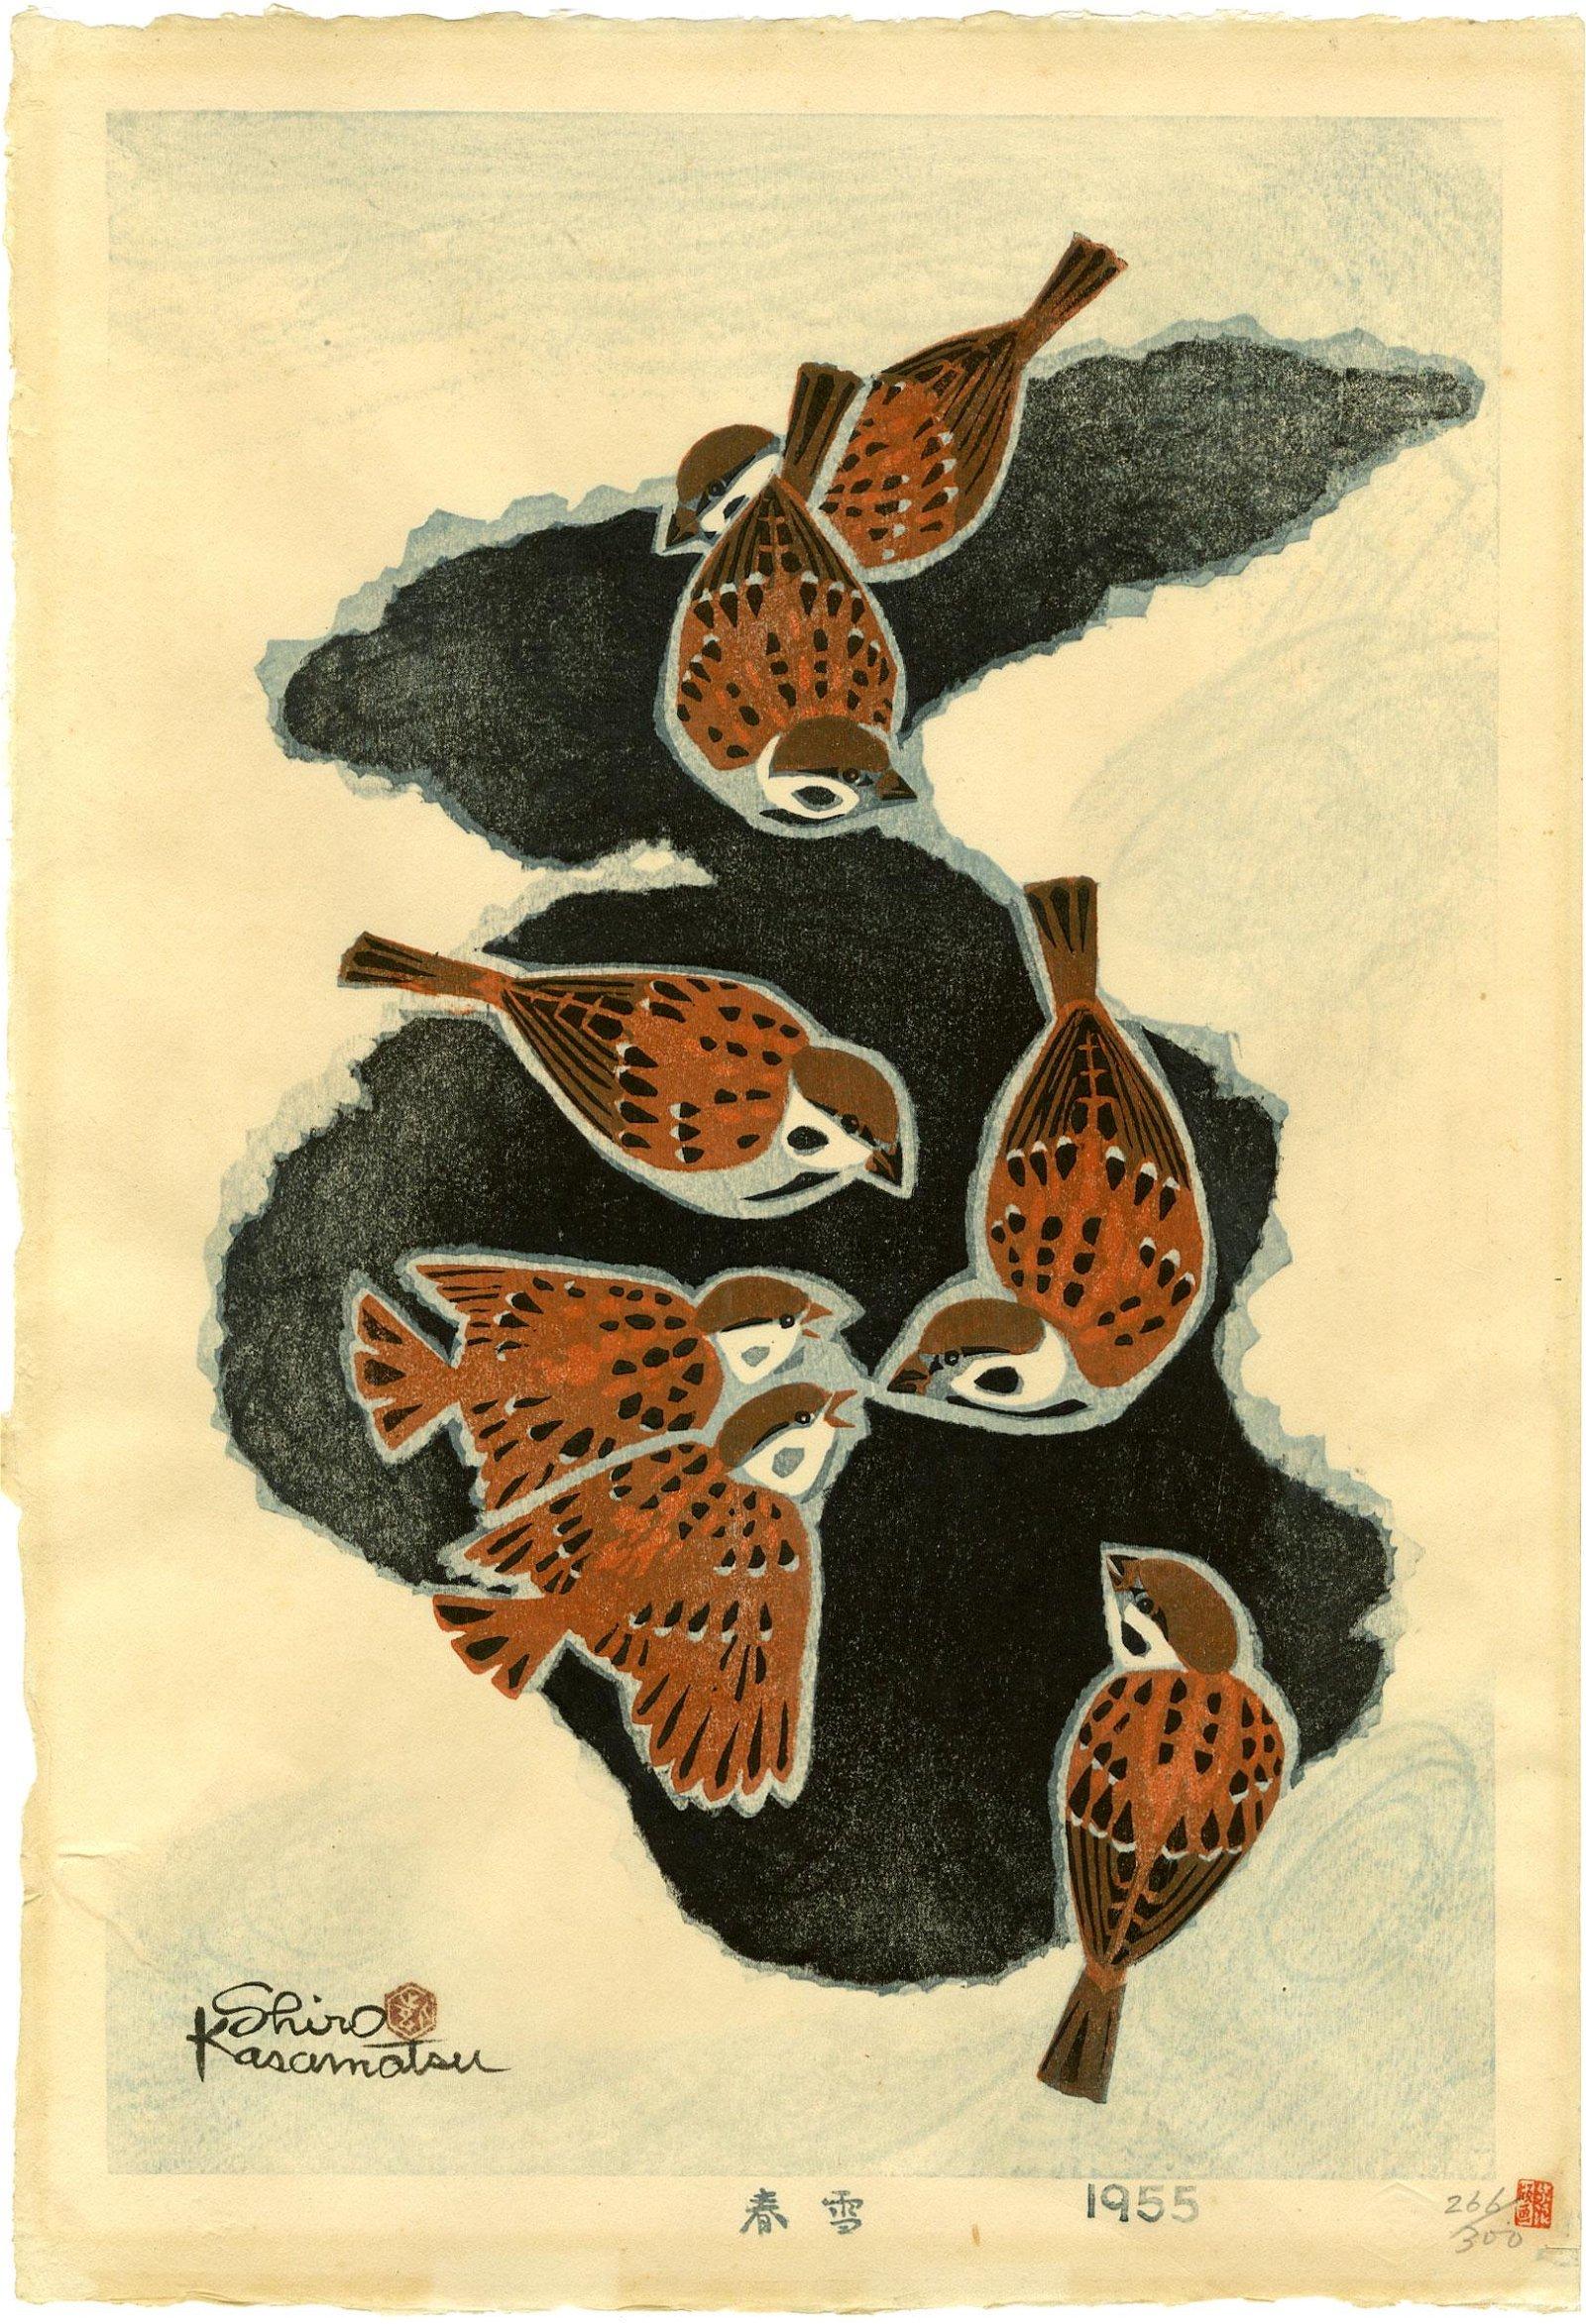 Kasamatsu Shiro: Spring Snow 1955 1st Edition Woodblock